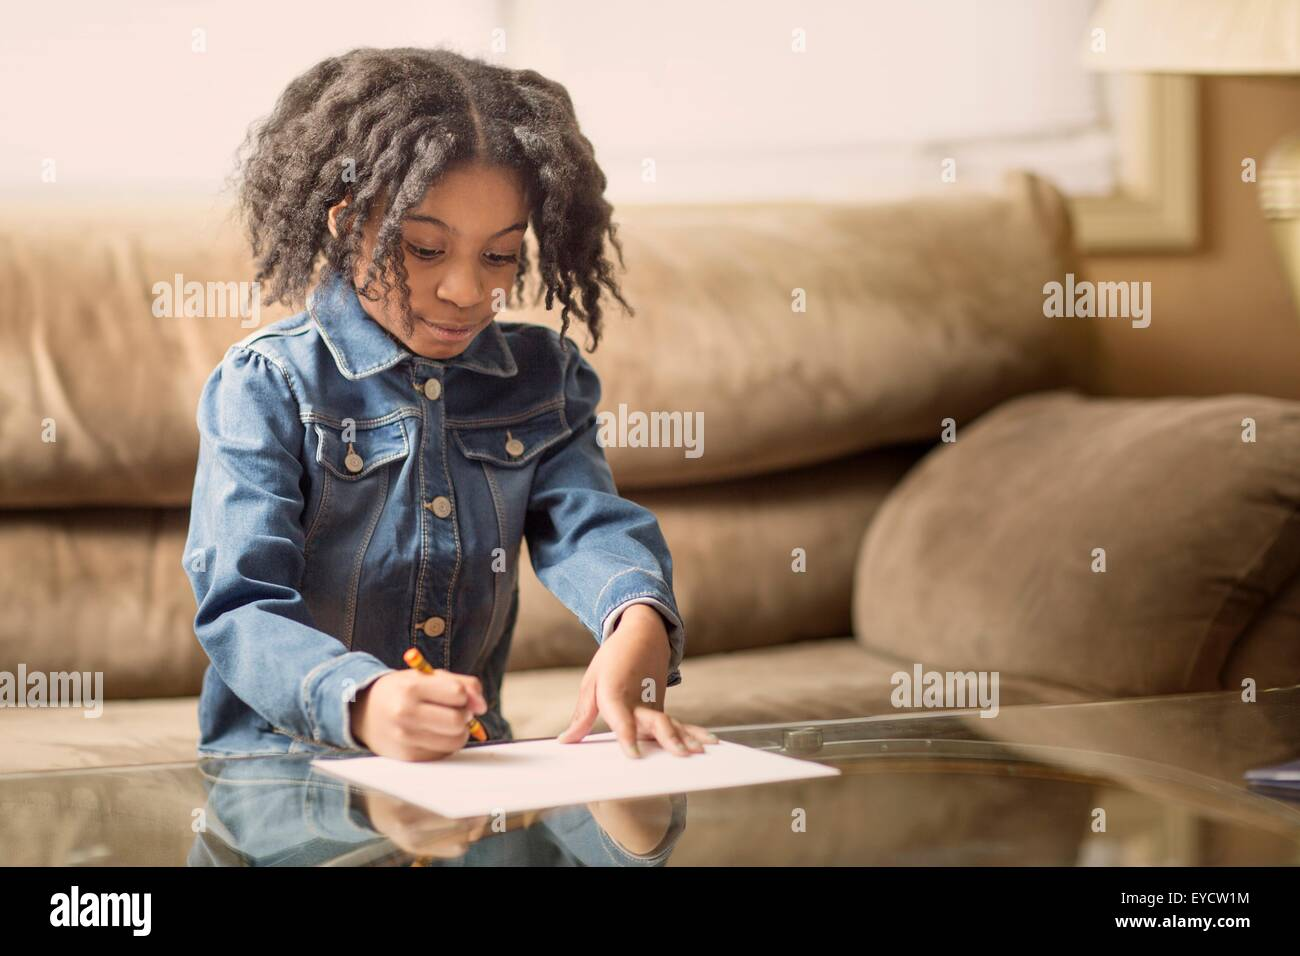 Girl drawing on coffee table - Stock Image